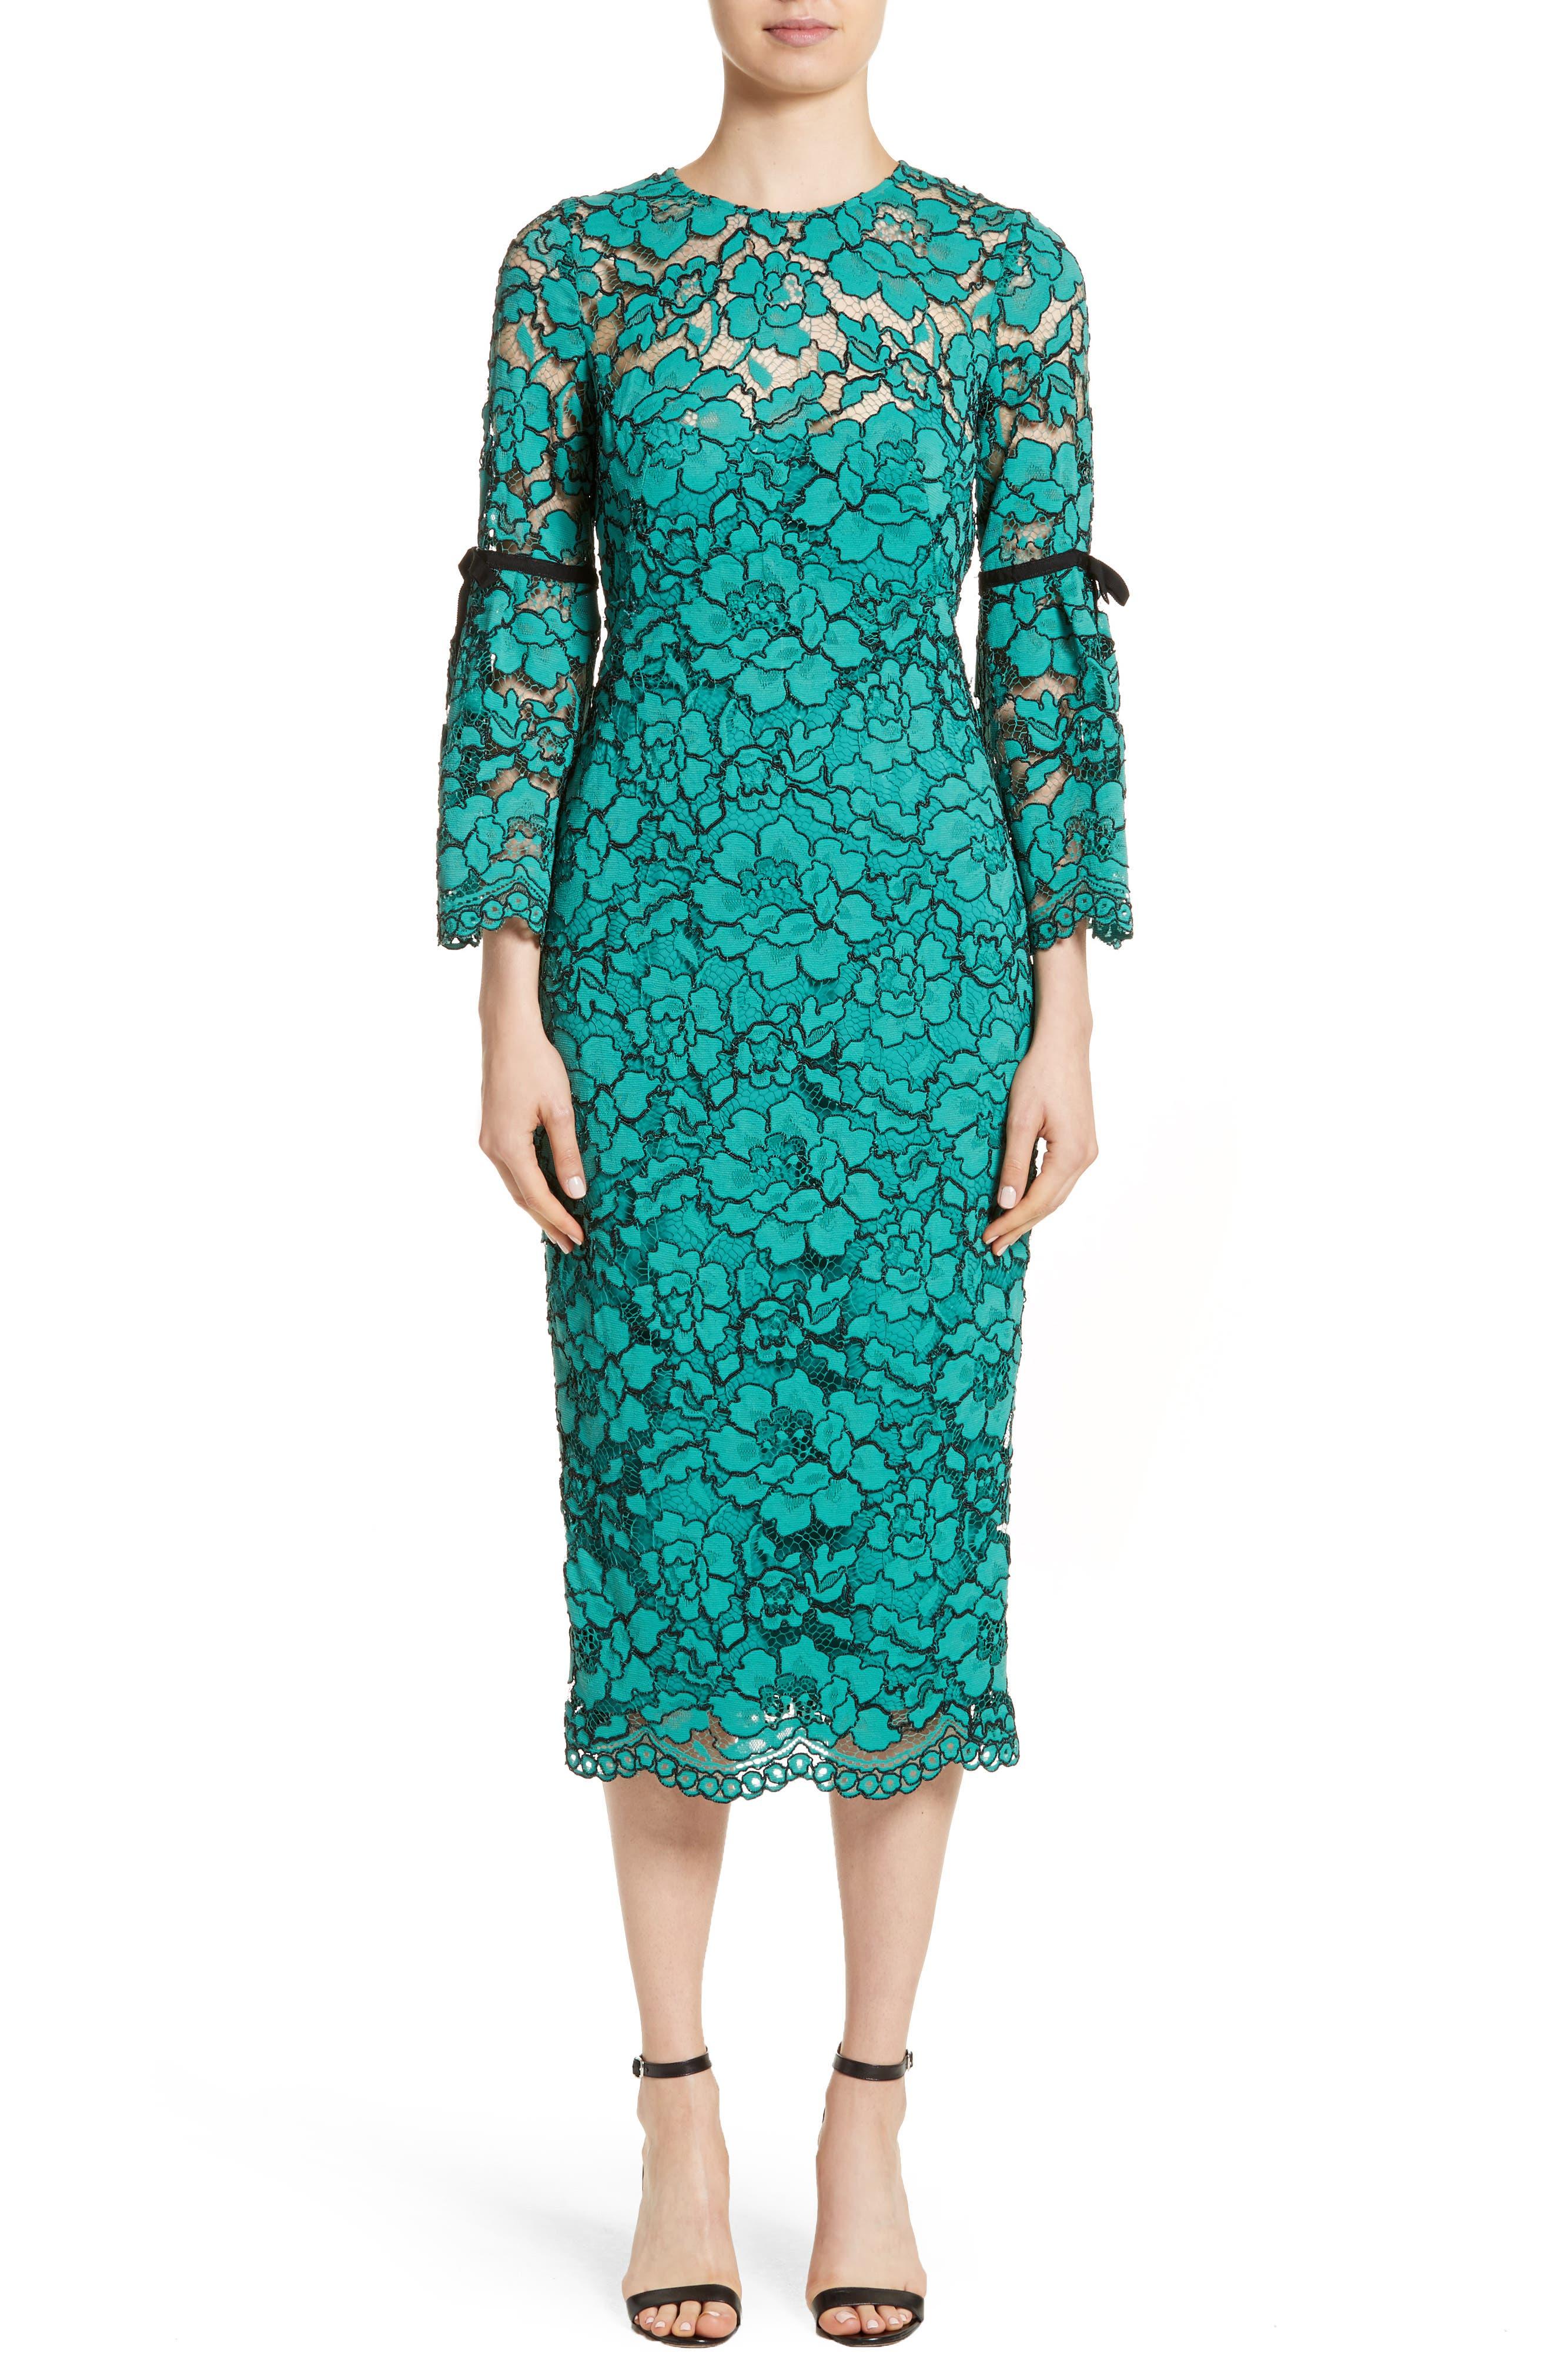 Alternate Image 1 Selected - Lela Rose Lace Bell Sleeve Sheath Dress